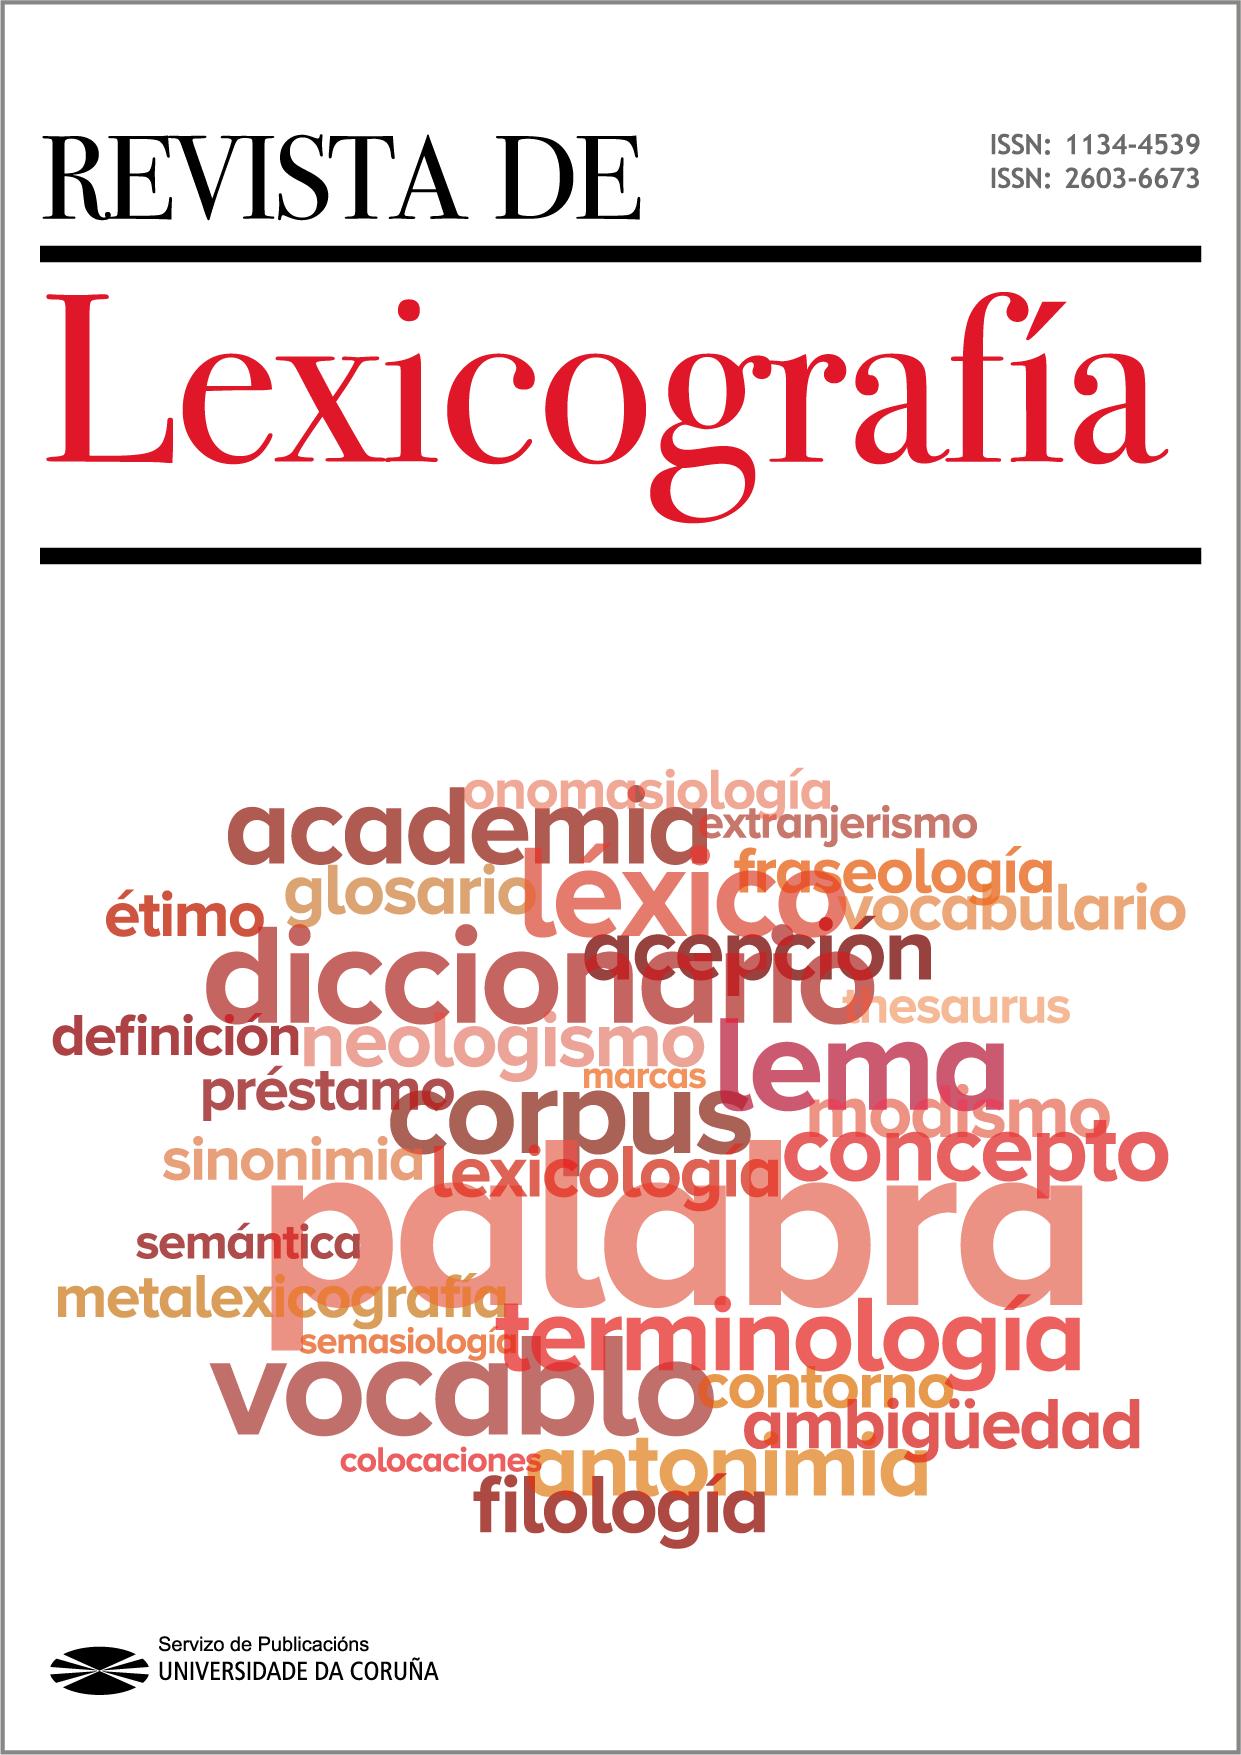 Portada de la Revista de Lexicografía